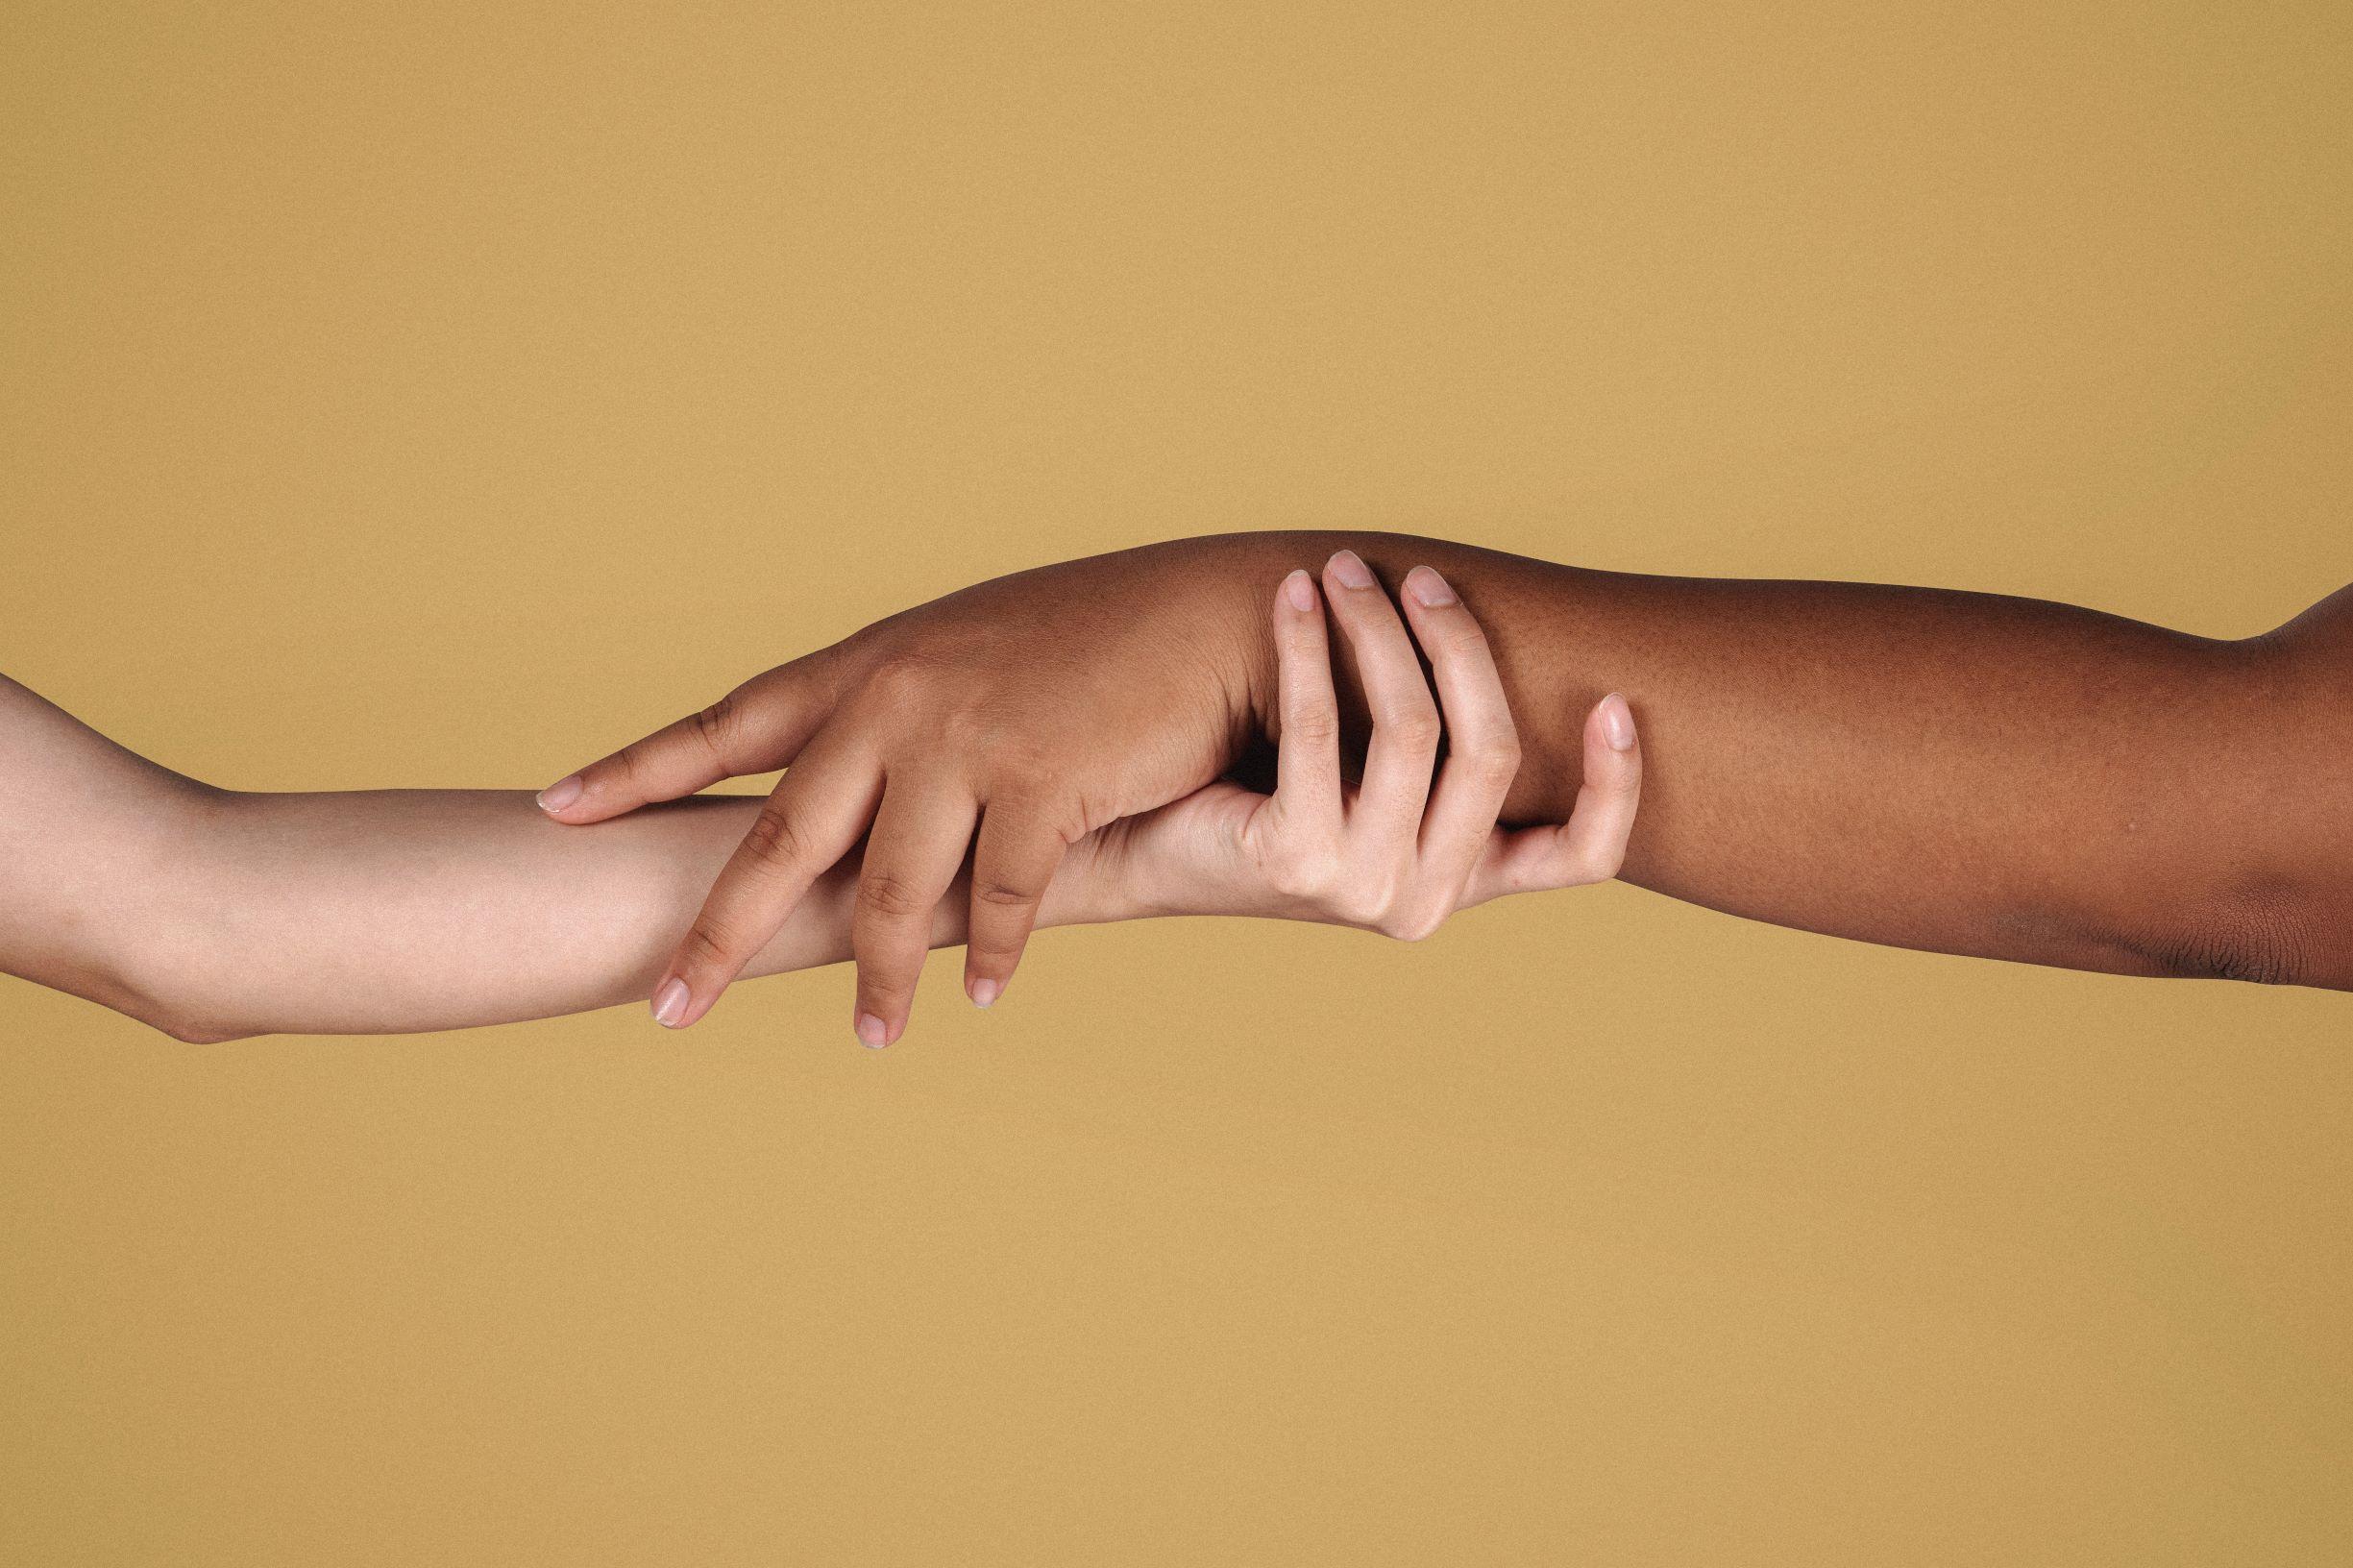 Celebrate International Friendship Day